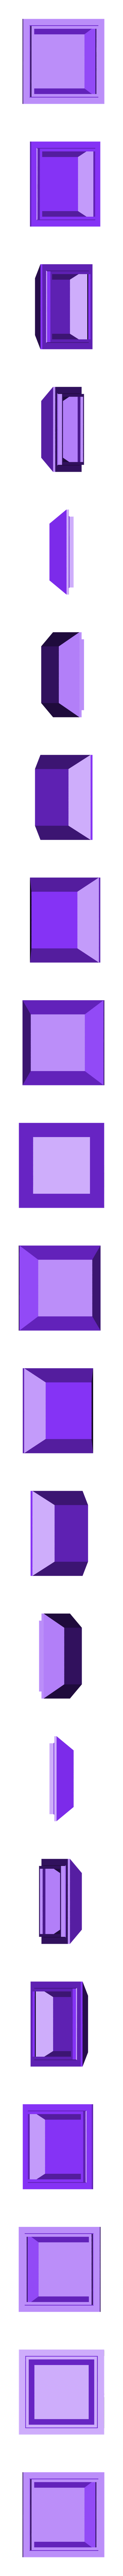 pyramid.bot.stl Download free STL file Piramid Starship Stargate • 3D printing design, TanyaAkinora